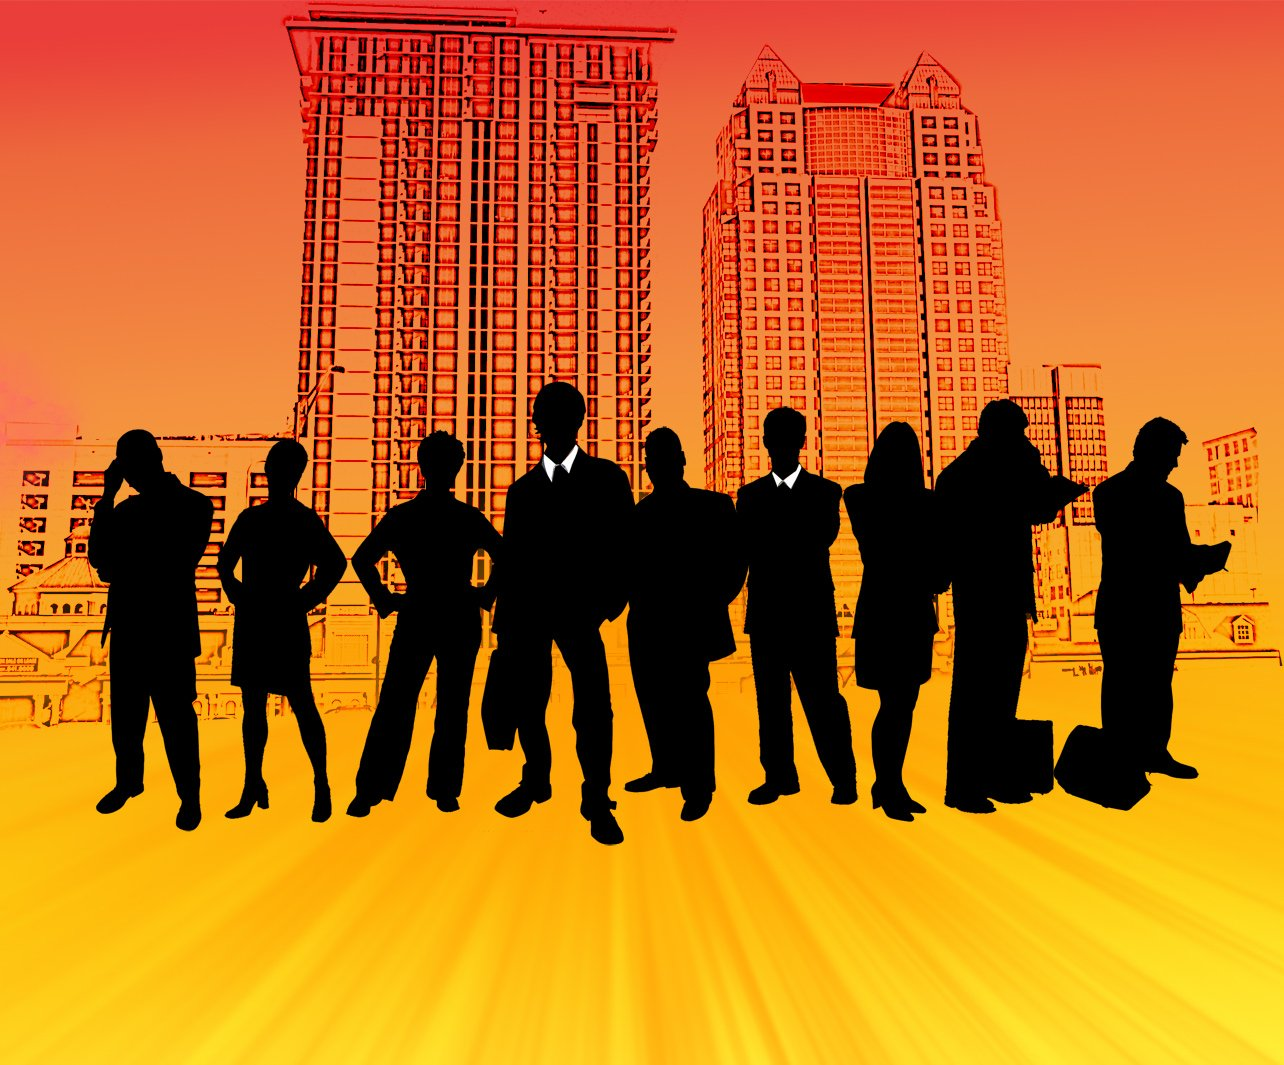 leadership training, management training, managing change, leadership in changing times